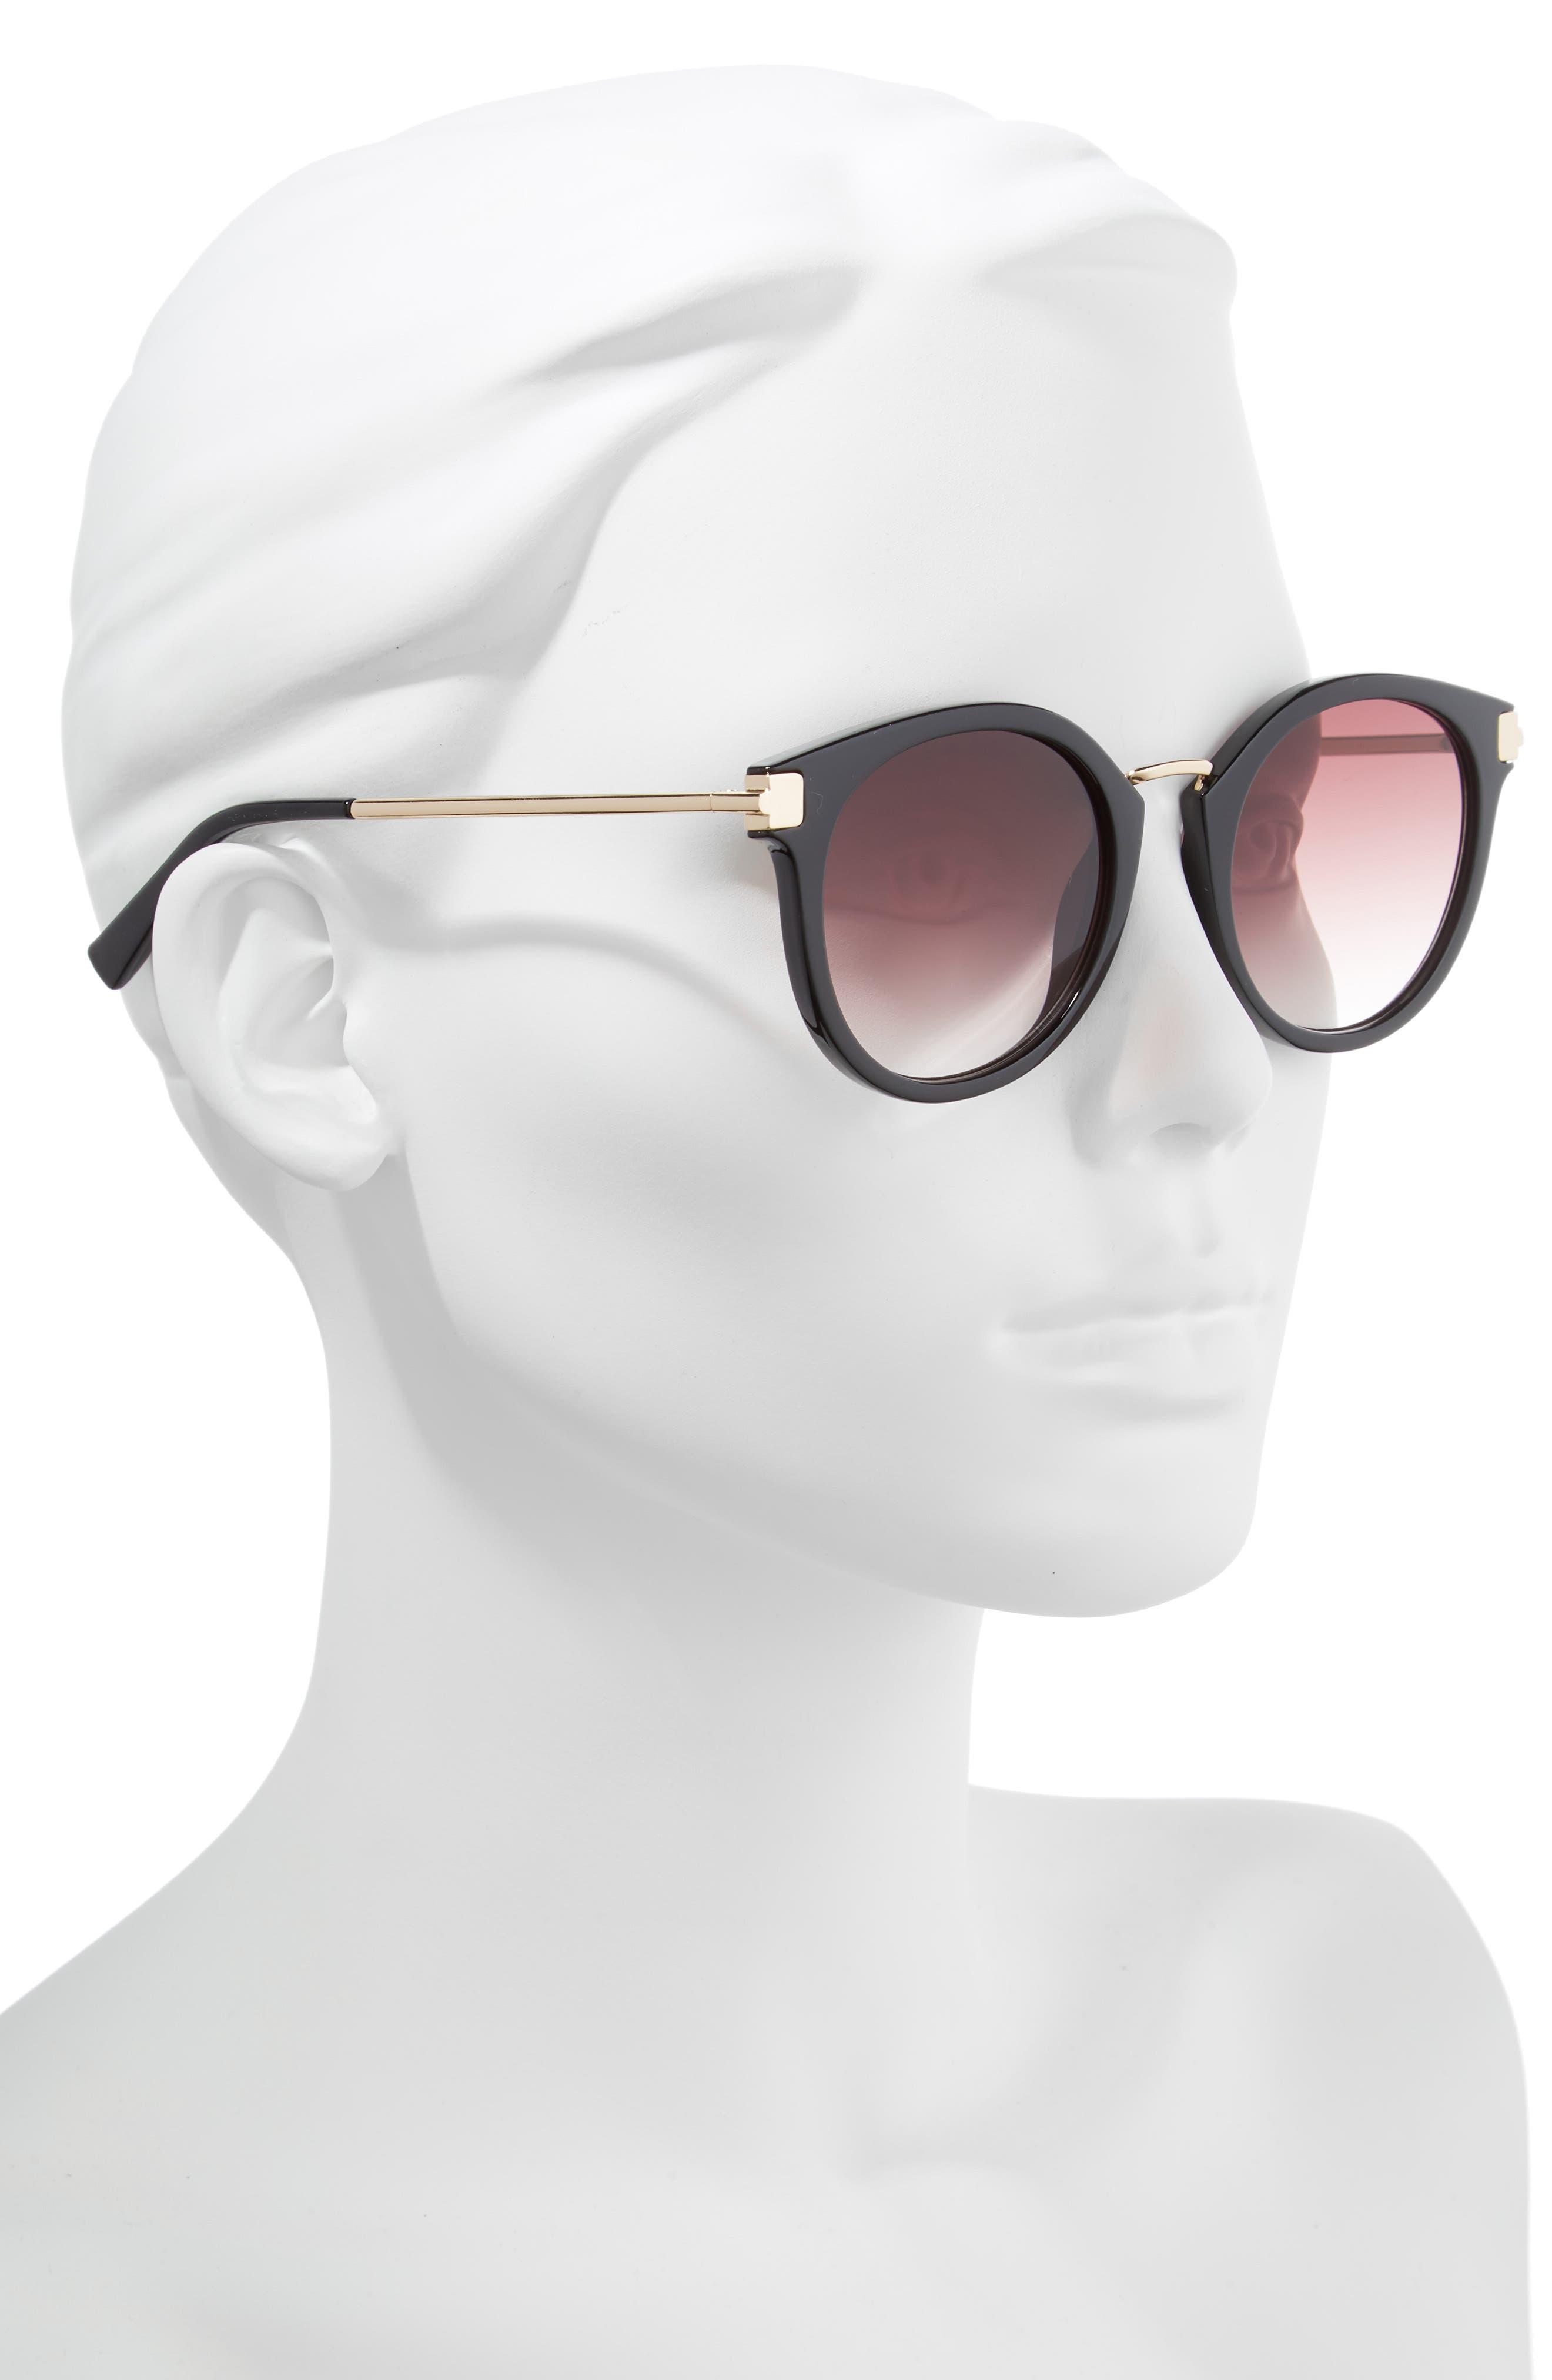 Last Dance 51mm Mirrored Round Sunglasses,                             Alternate thumbnail 2, color,                             BLACK